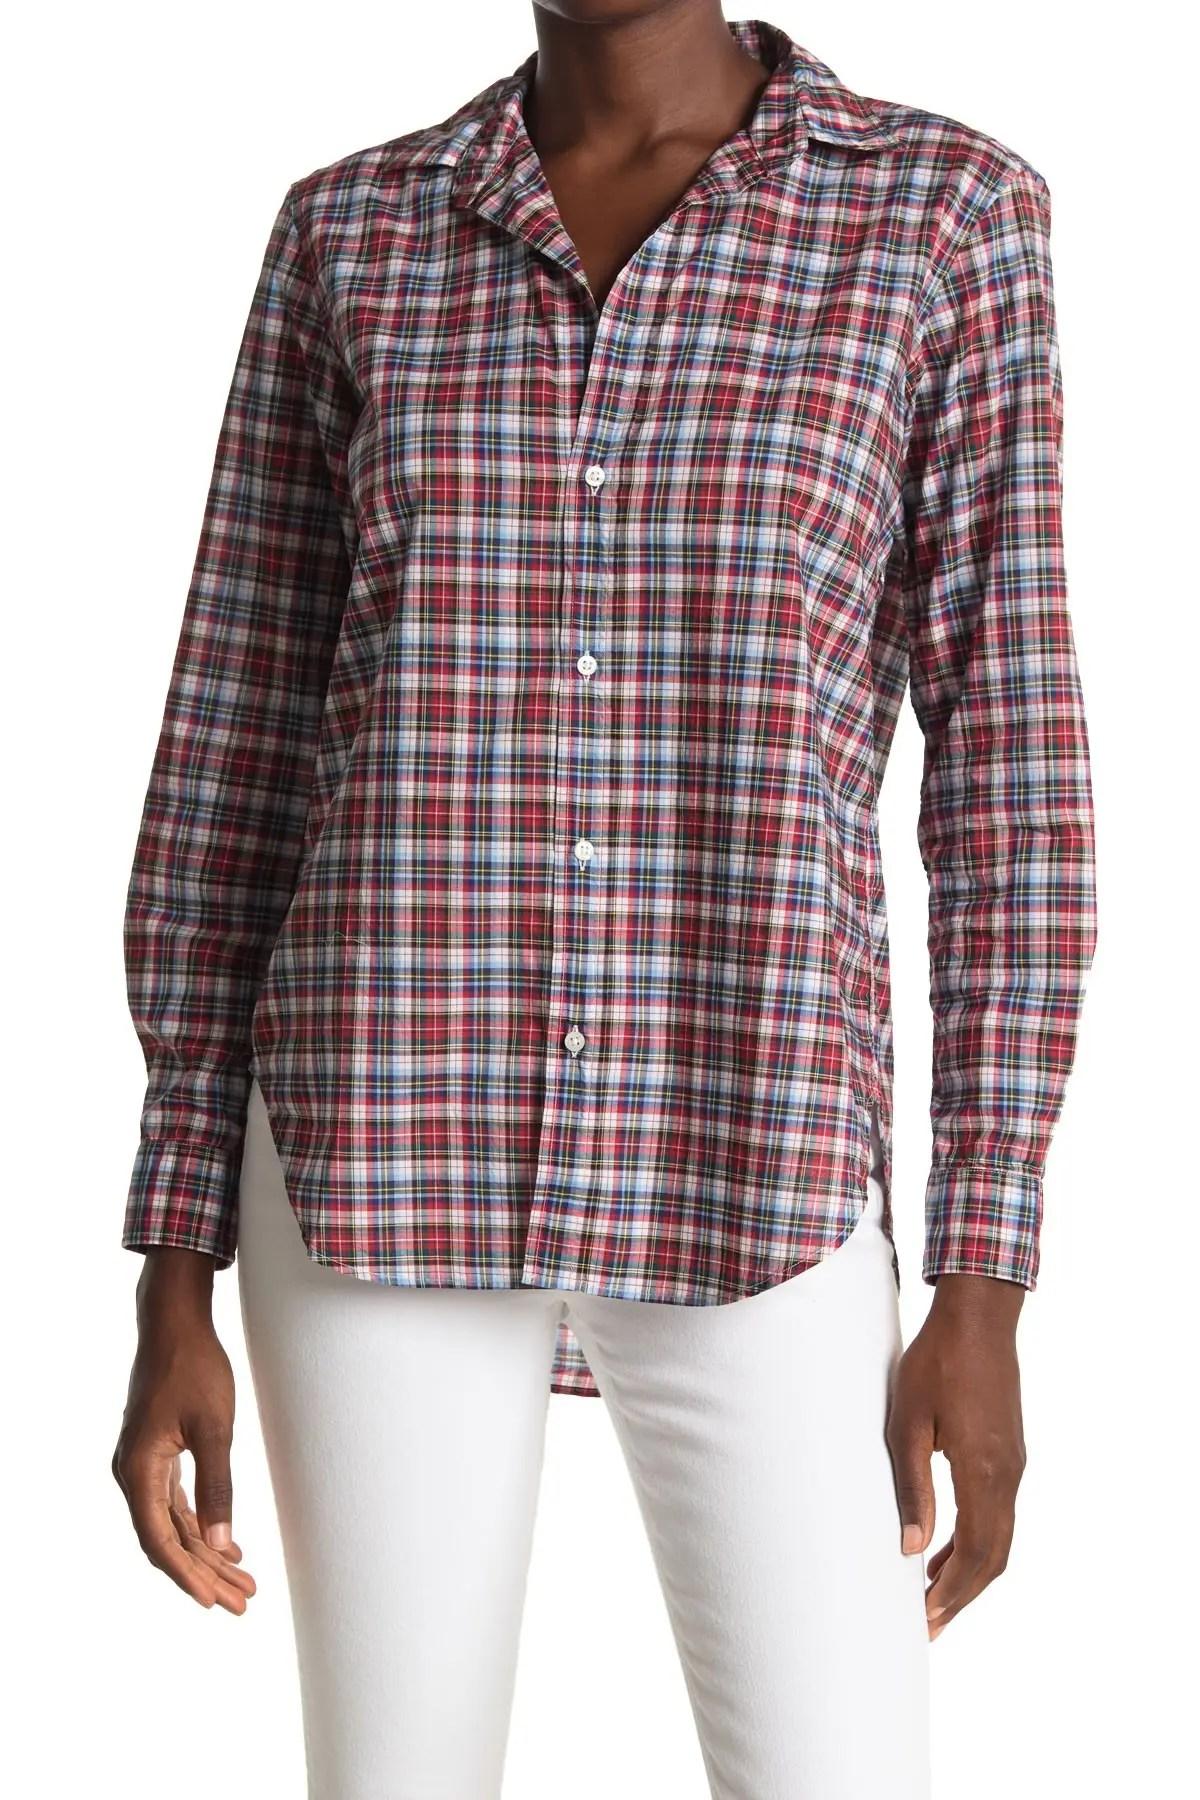 frank eileen frank plaid woven collared shirt nordstrom rack